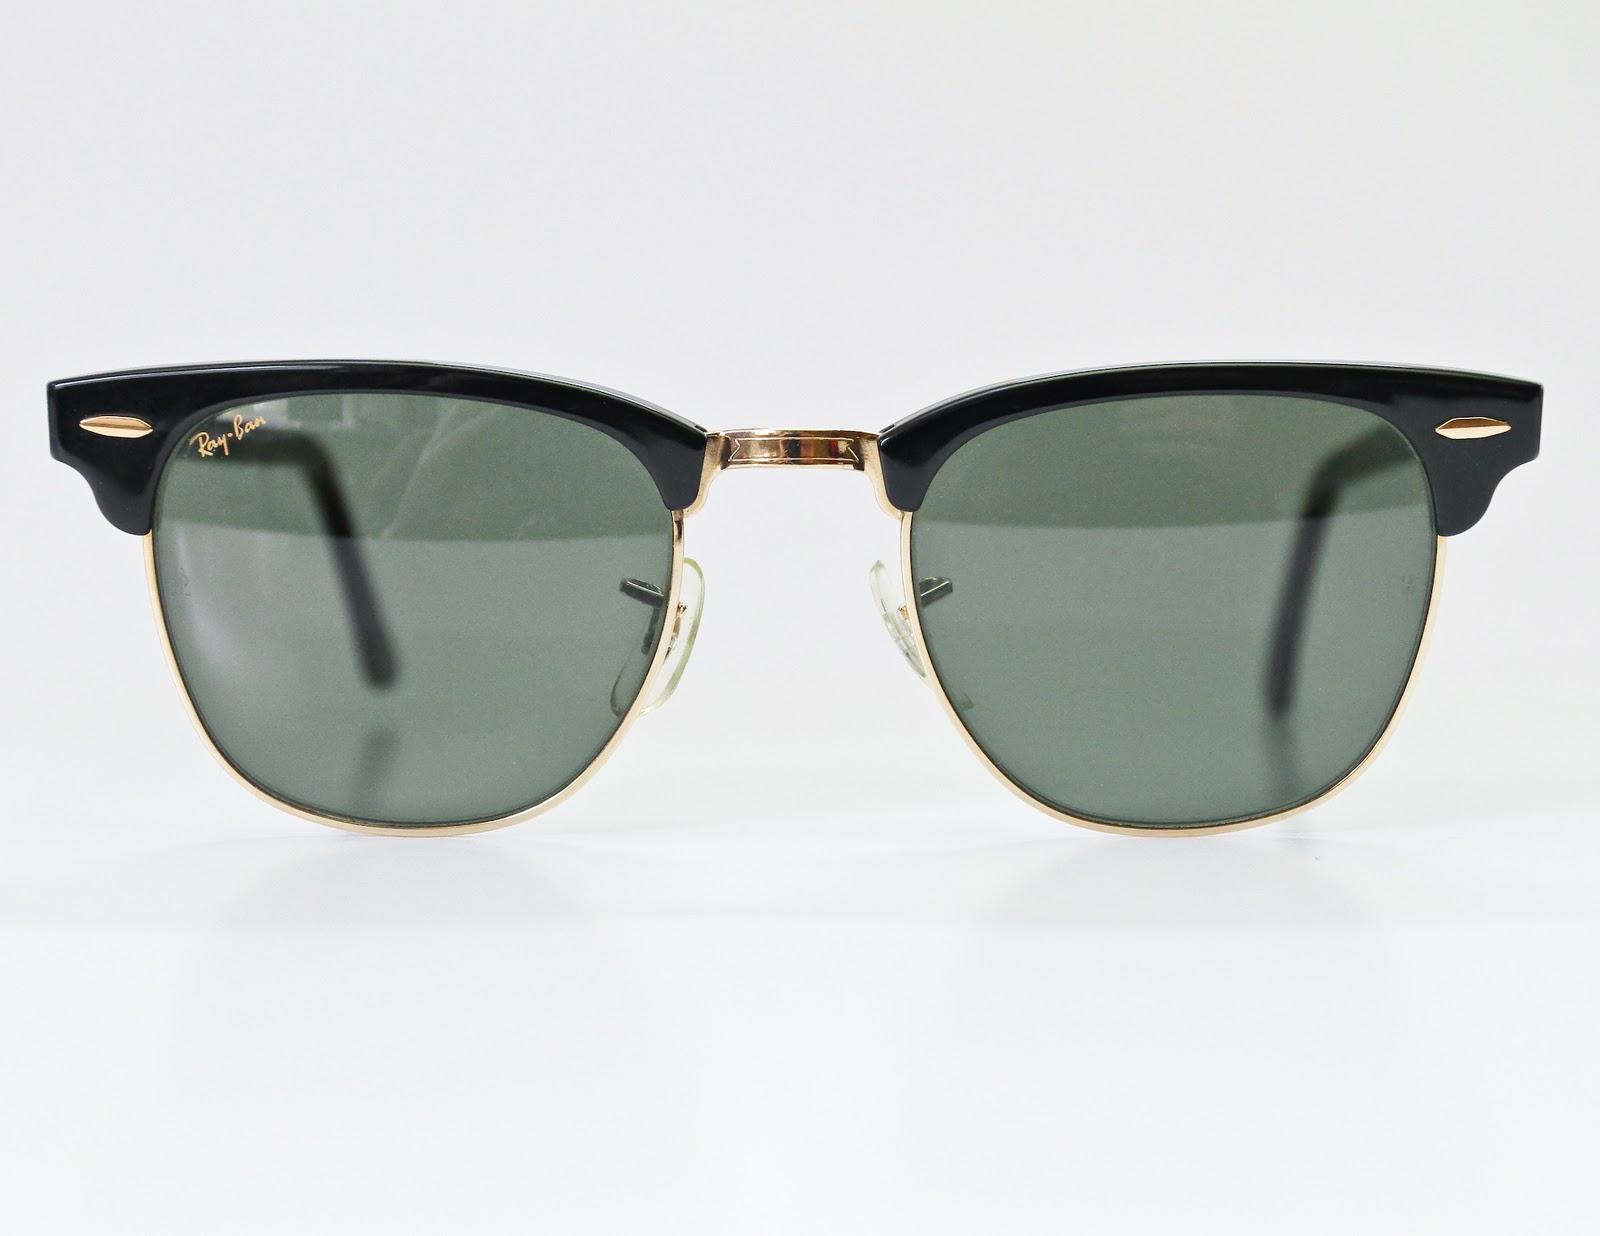 Ray Ban Vintage Glasses Frames : ray ban glasses vintage